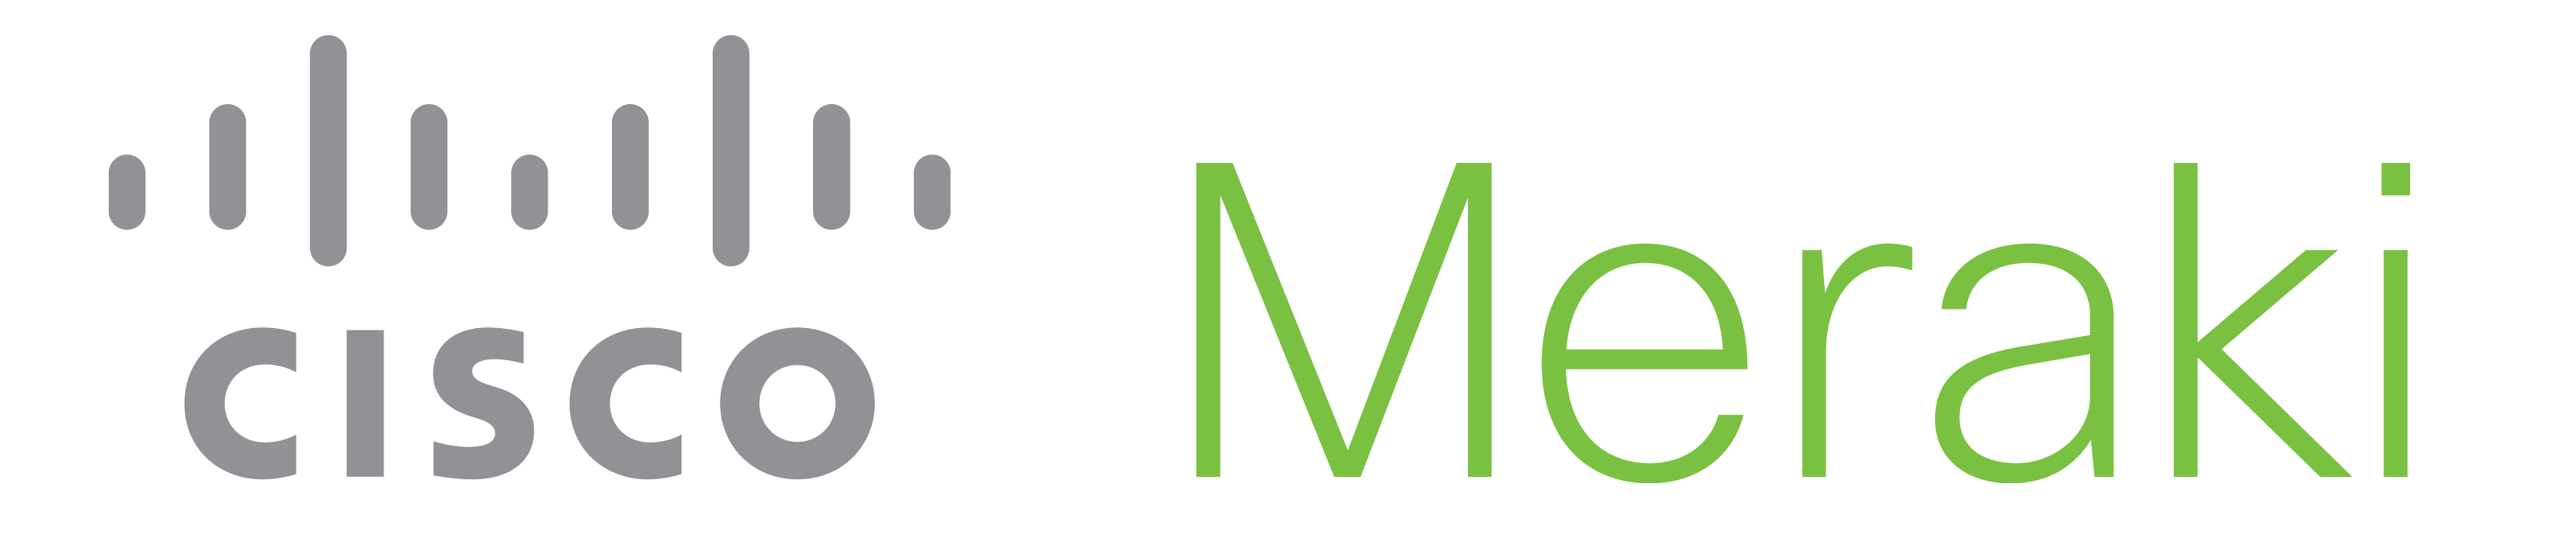 CSC Consulting Group - Cisco Meraki Logo